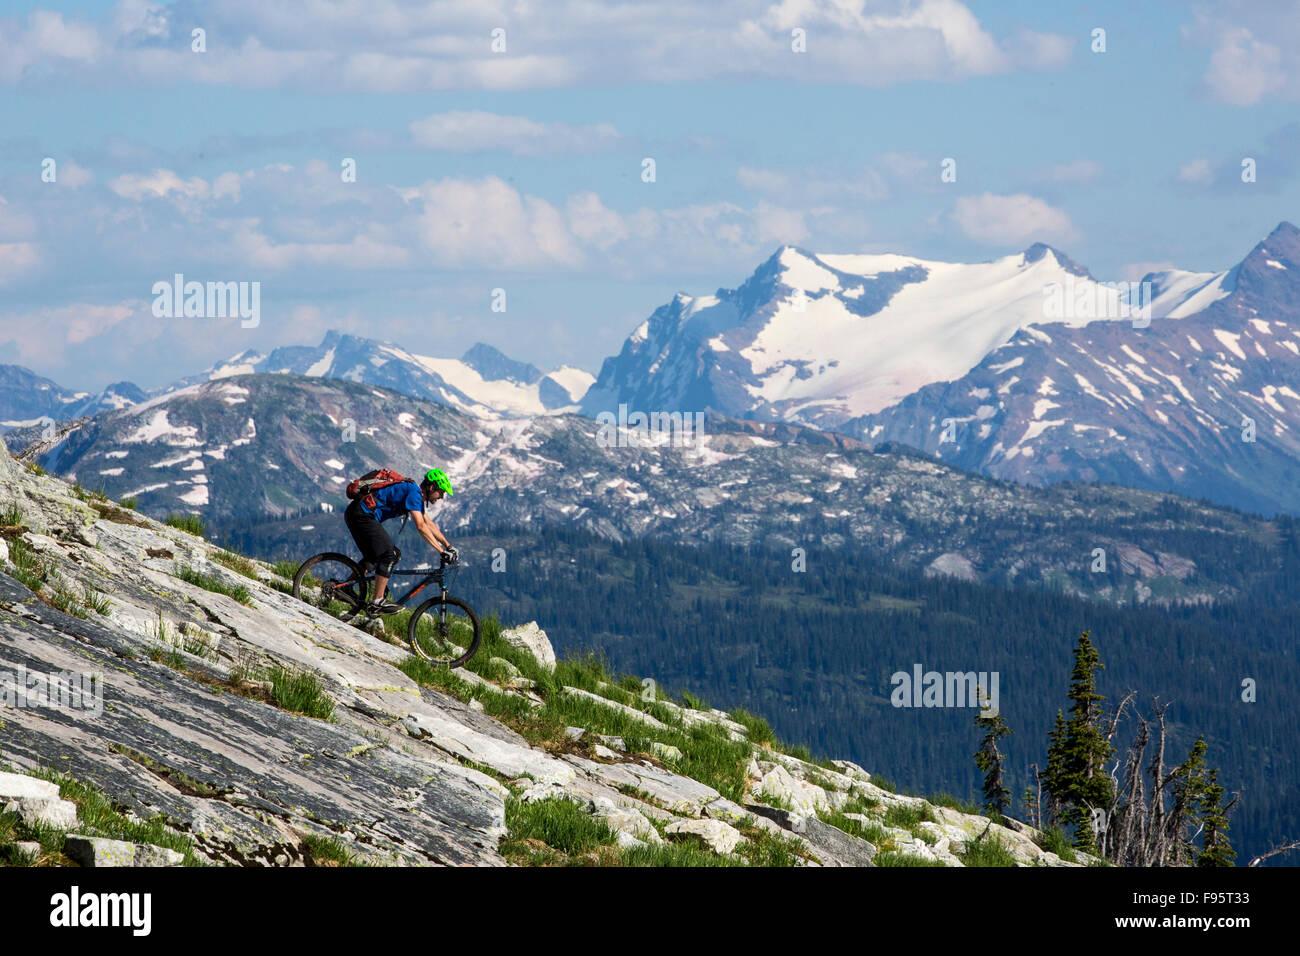 Ciclismo de montaña, Eagle Pass, el Monte Inglés, montañas Monashee, Revelstoke, British Columbia, Imagen De Stock